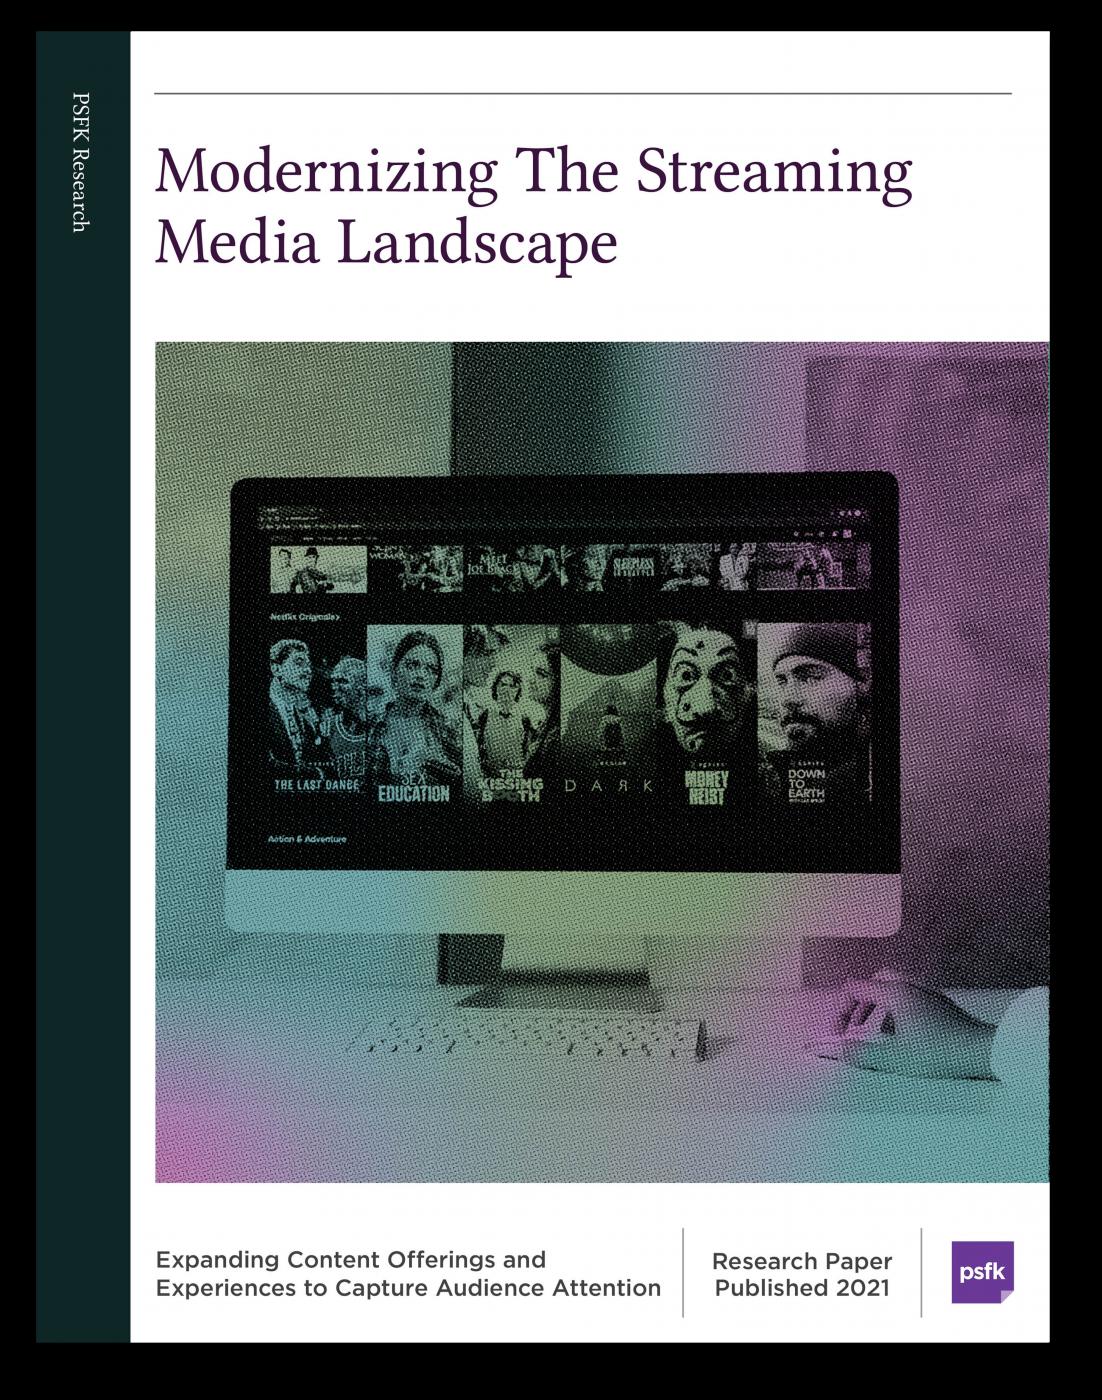 Modernizing The Streaming Media Landscape